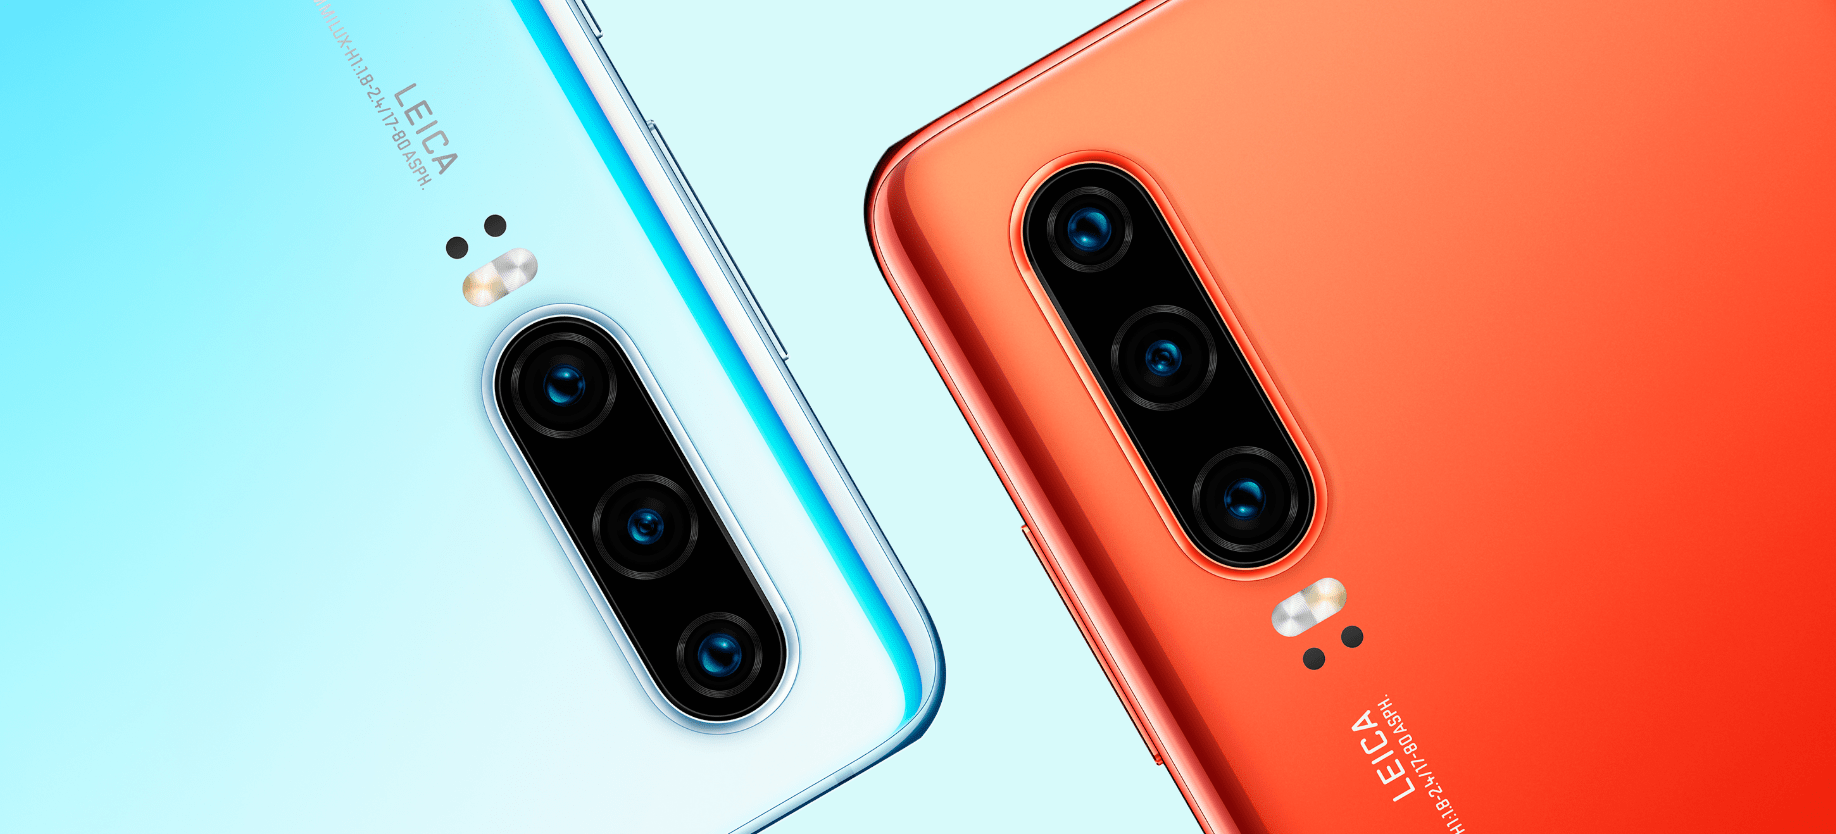 Orange and Blue Huawei P30 phones